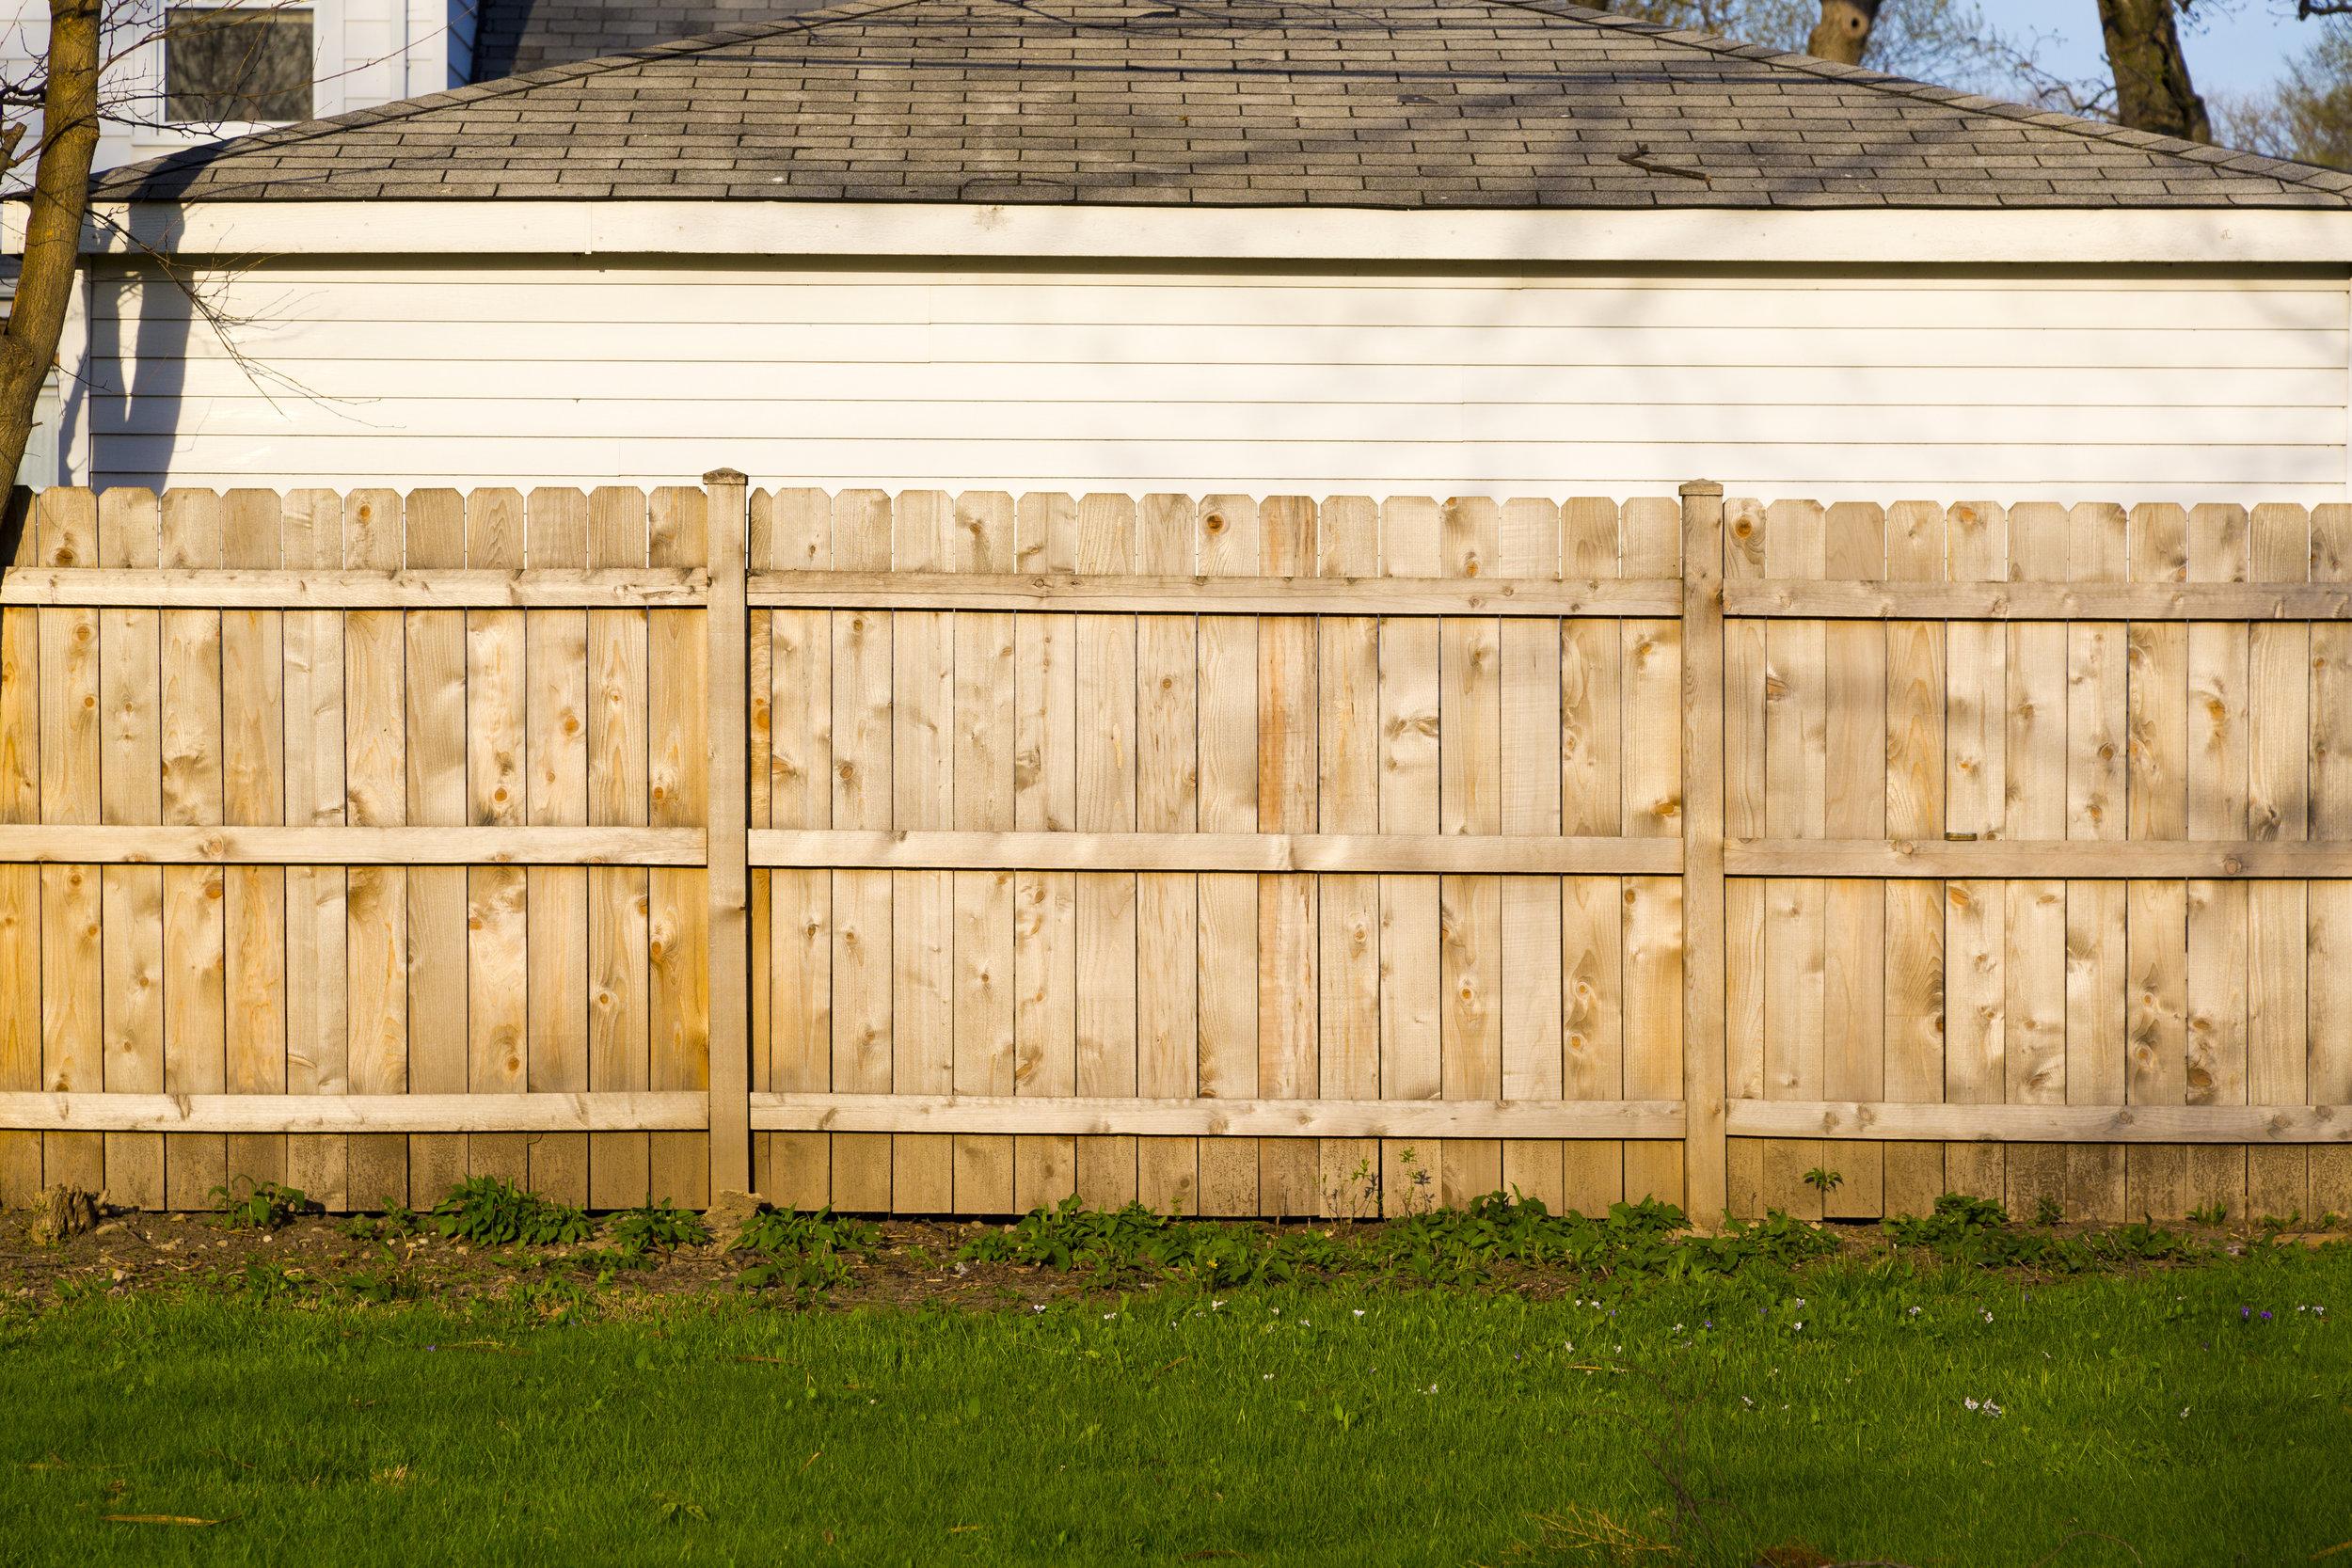 real wood - fencing panel - Adobe Fence Photo 1.jpeg